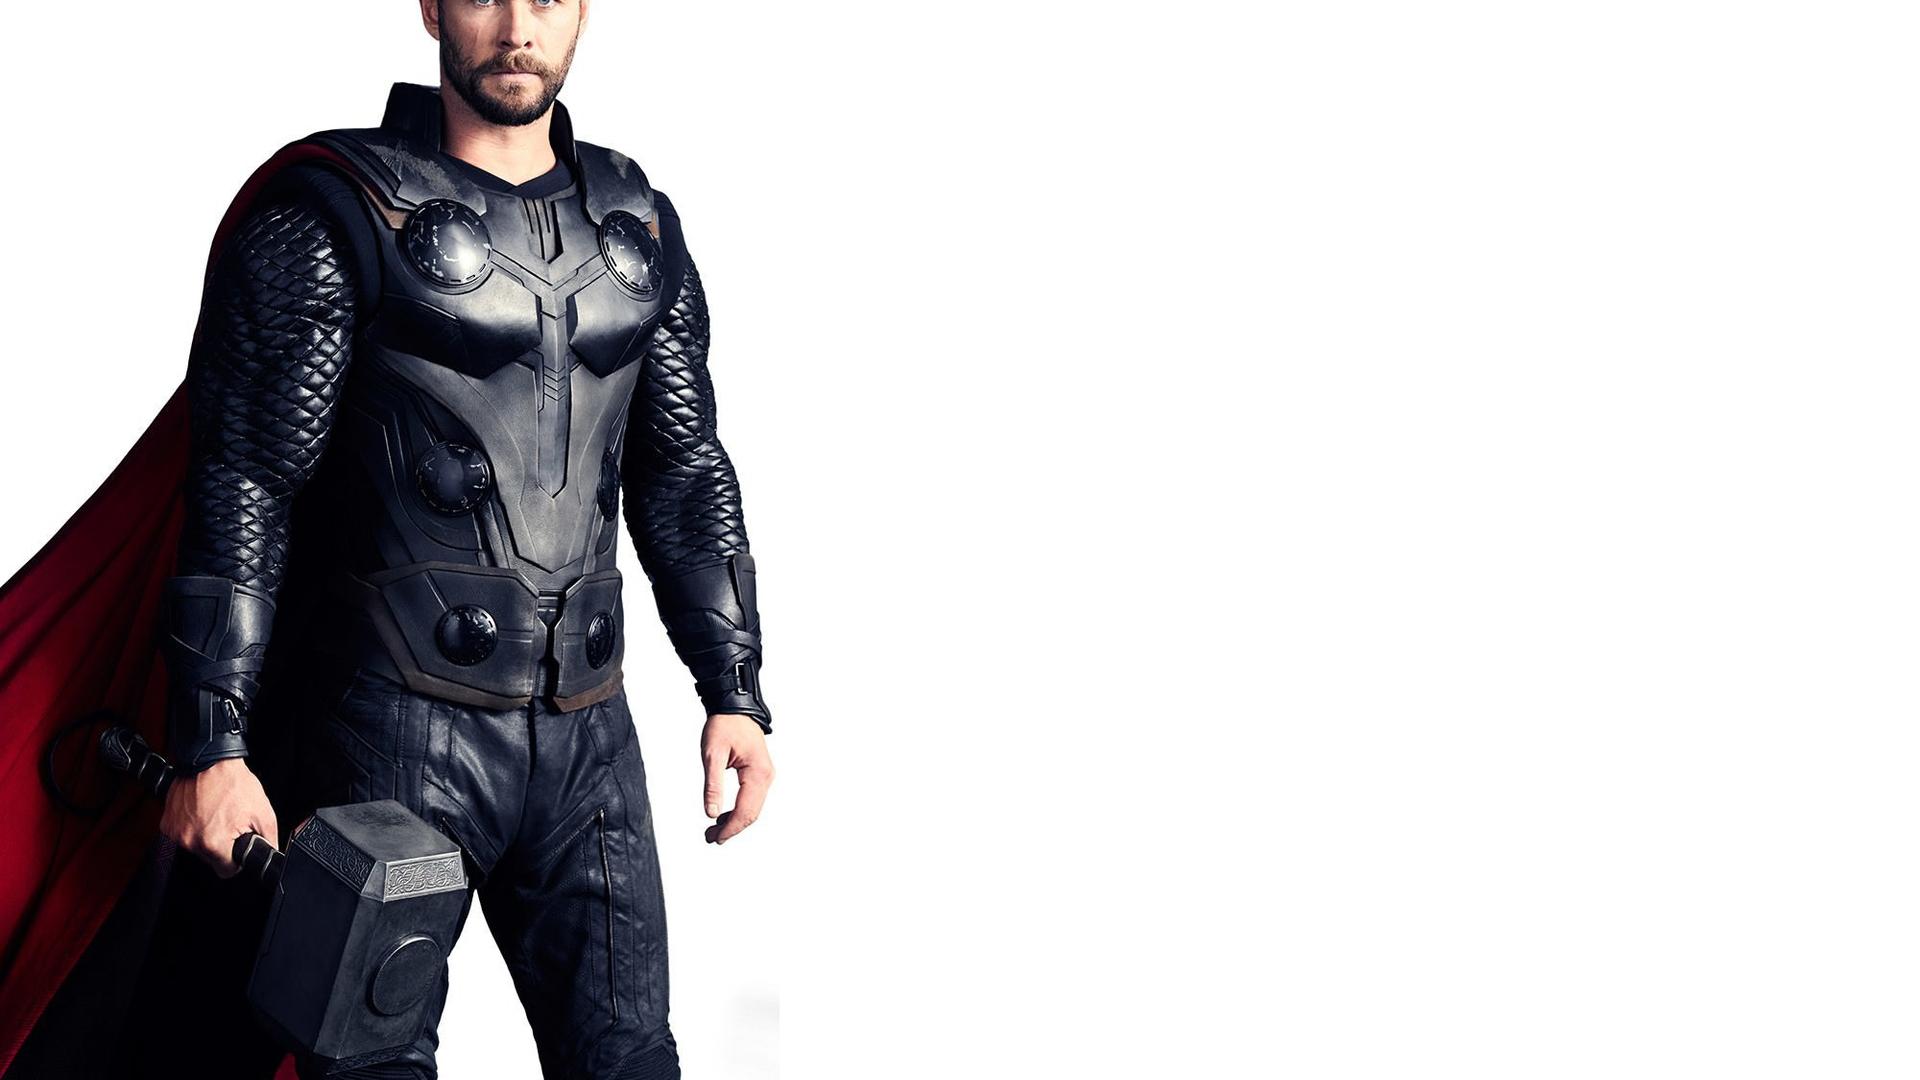 1920x1080 Thor In Avengers Infinity War 2018 Laptop Full Hd 1080p Hd